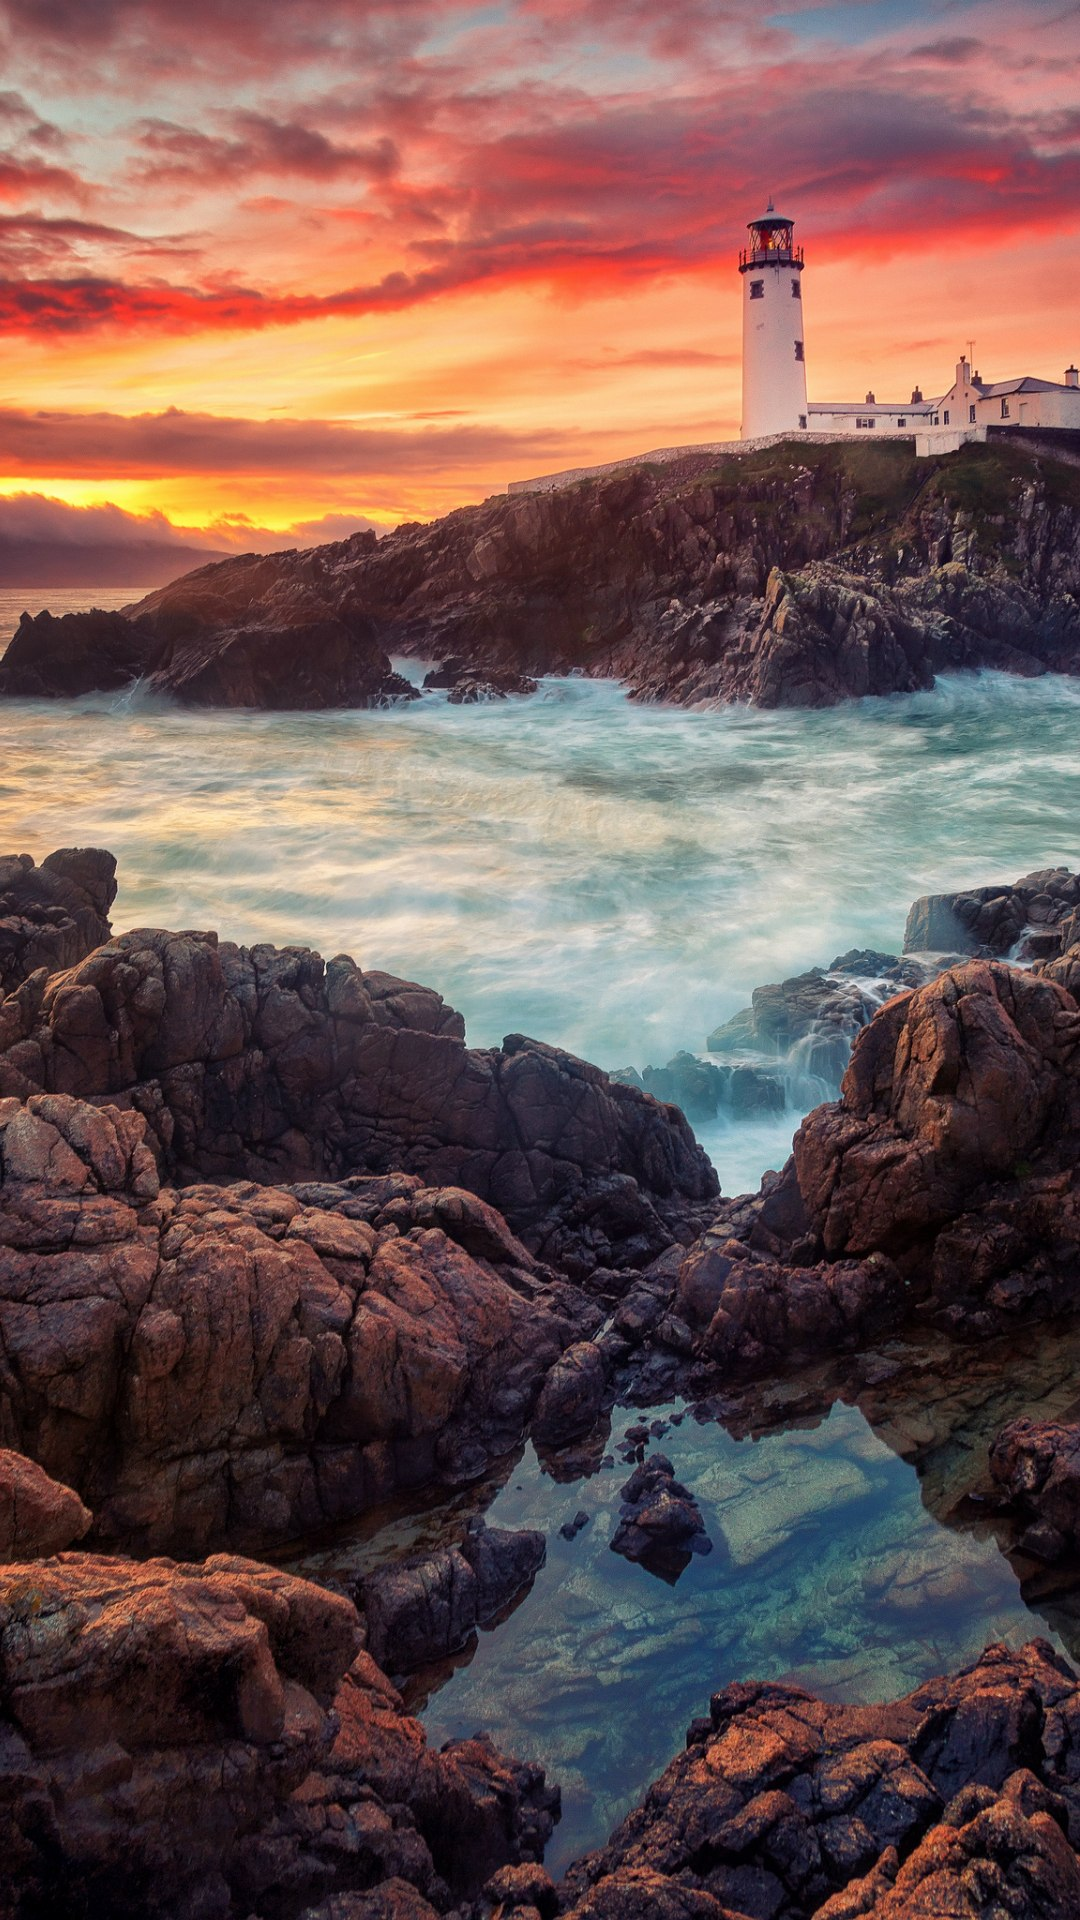 lighthouse sunset ocean stones 1080x1920